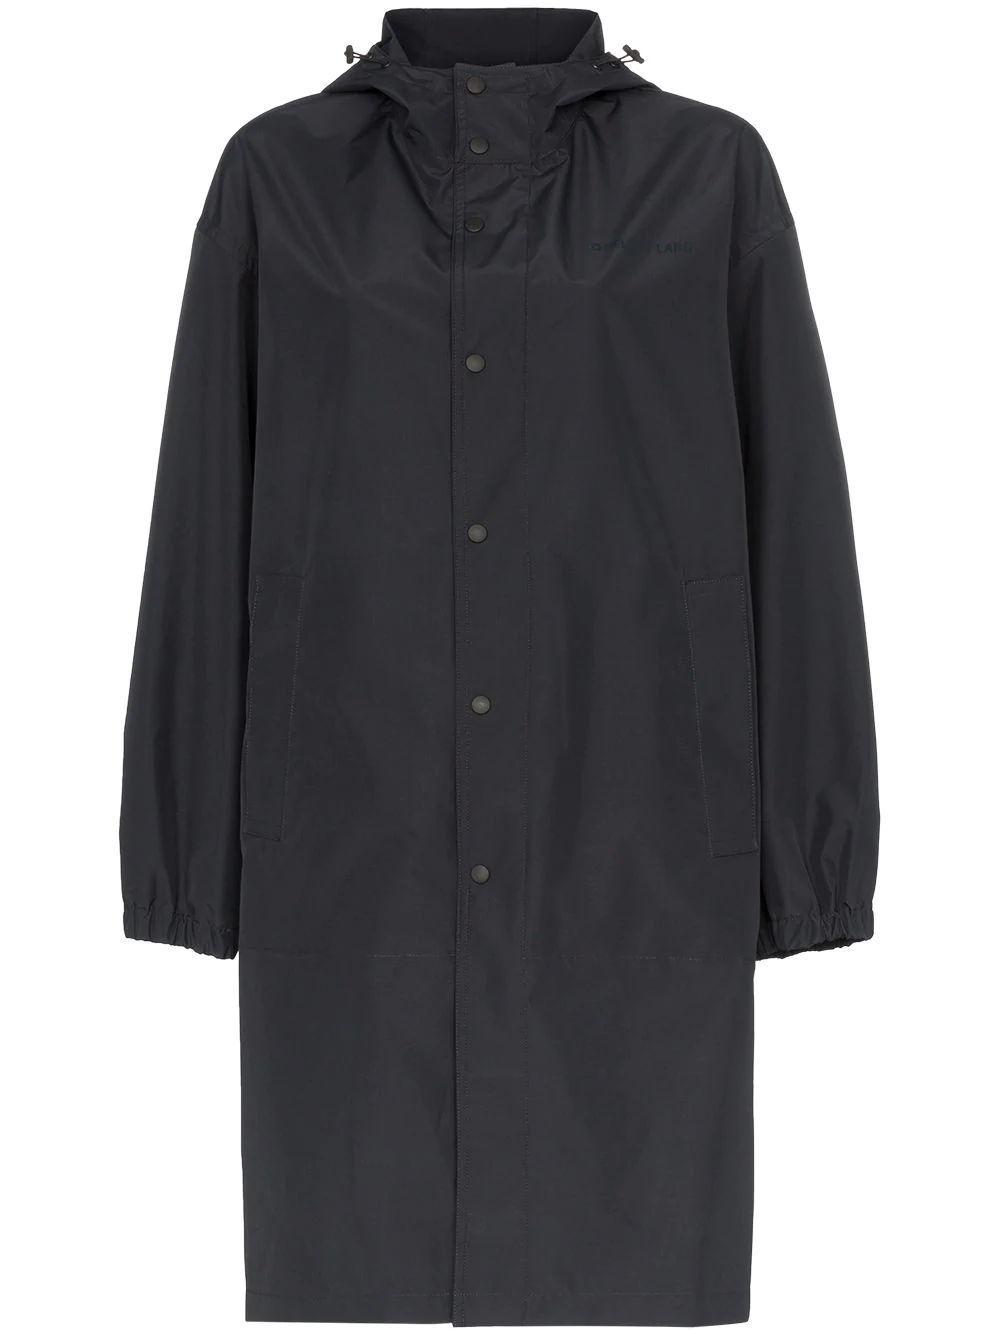 Hooded Raincoat Item # I06NW401